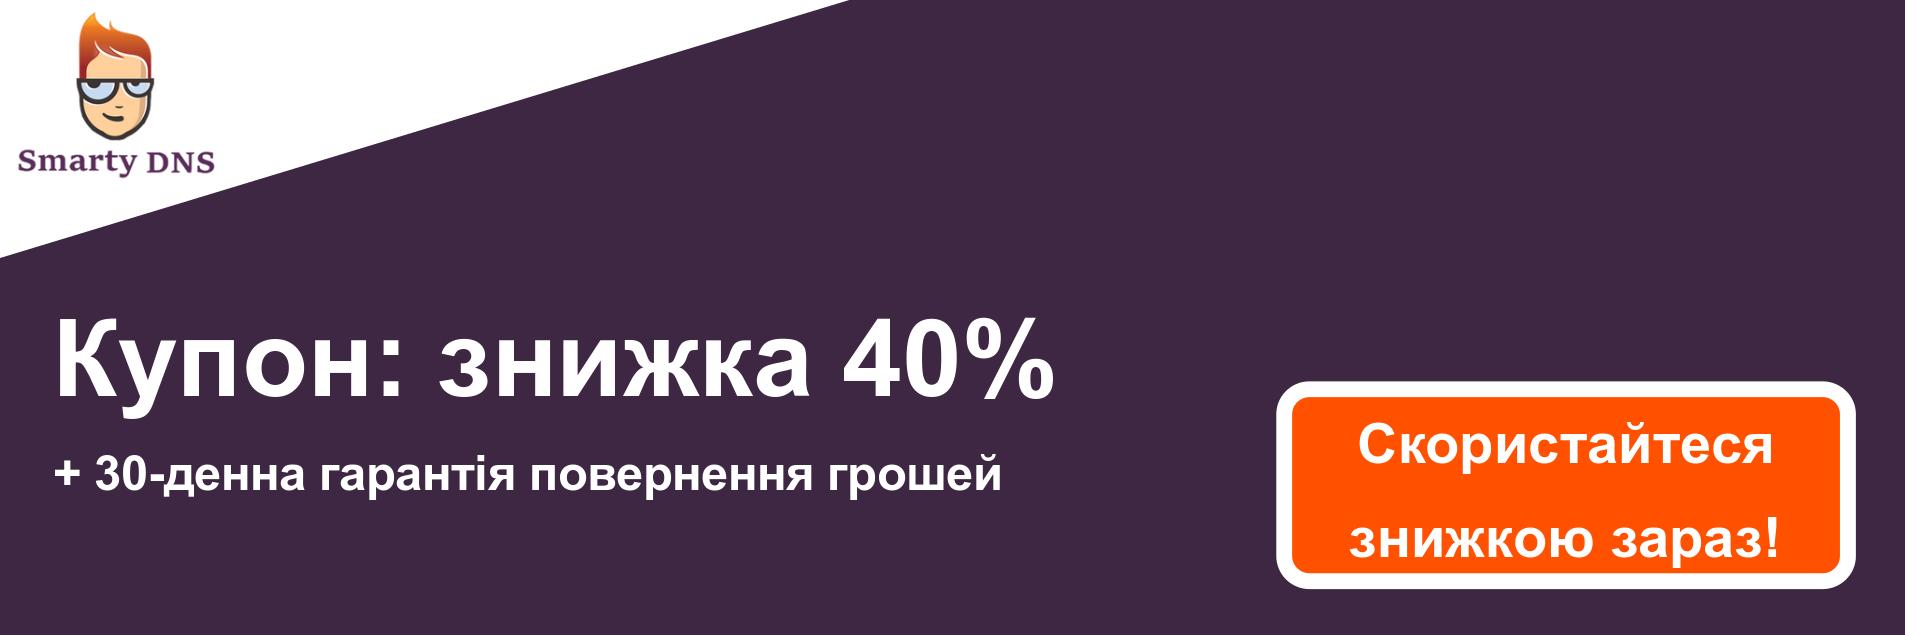 Банер купона SmartyDNS - знижка 40%